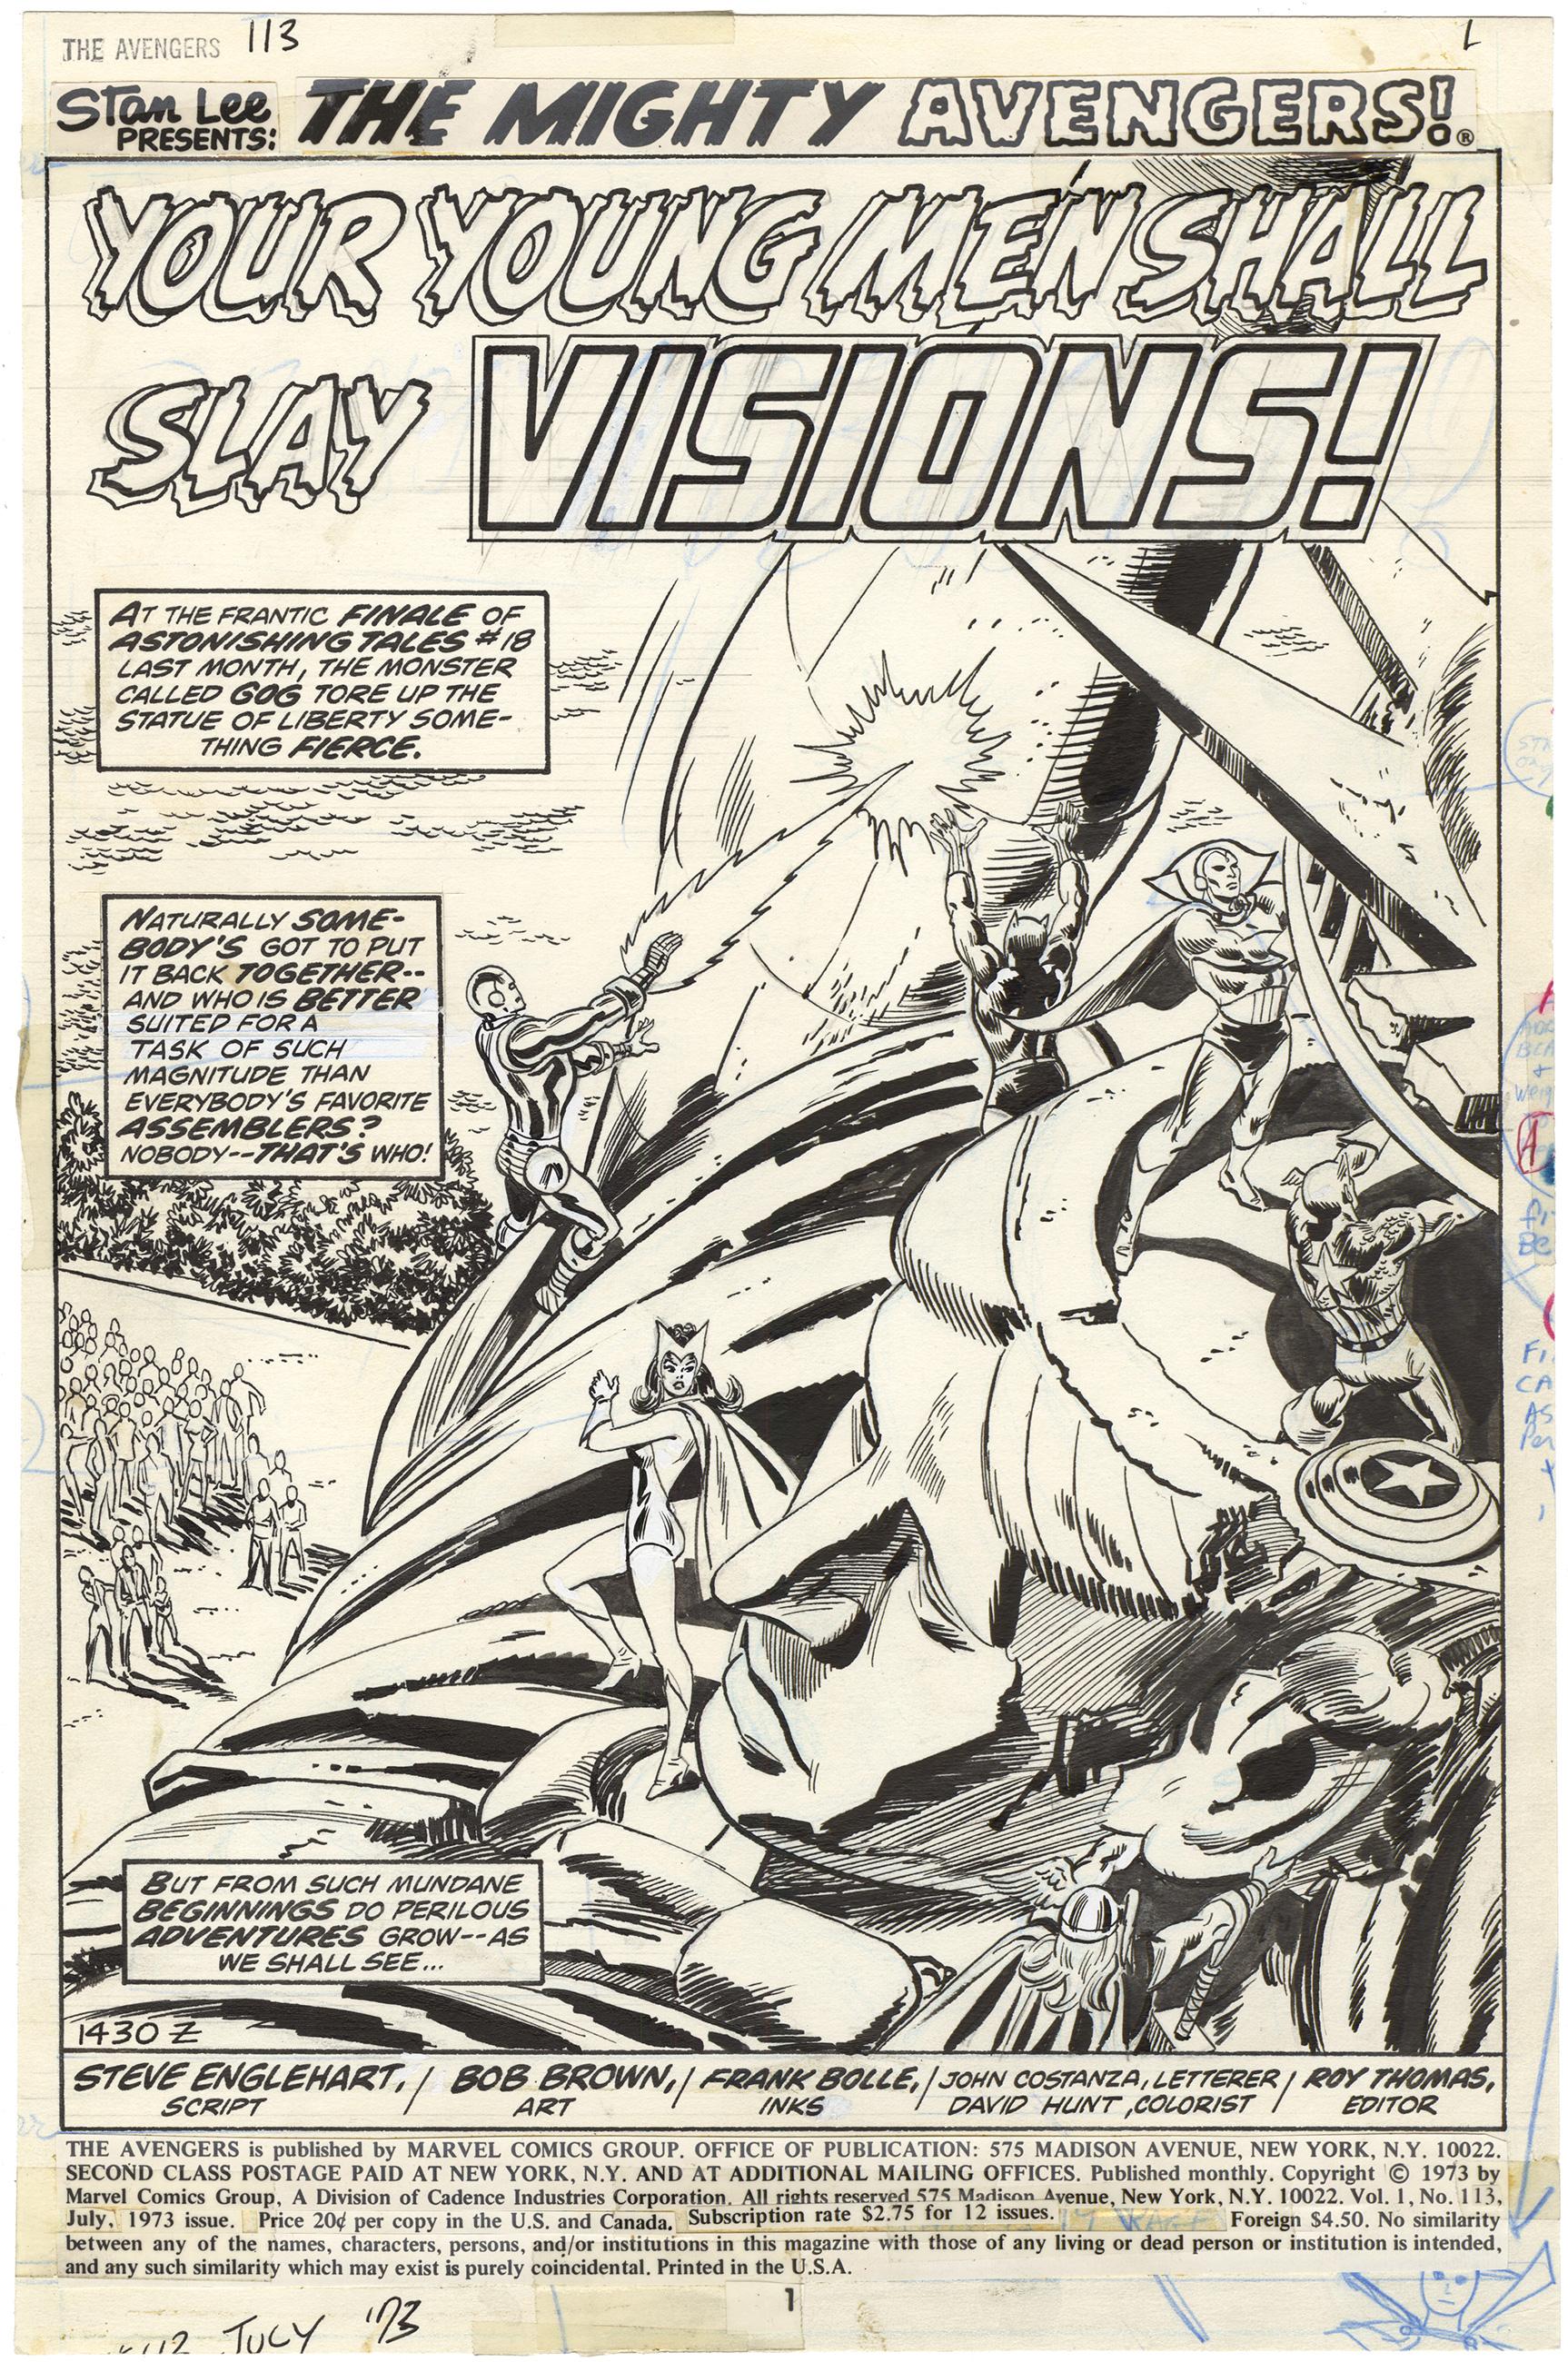 Avengers #113 p1